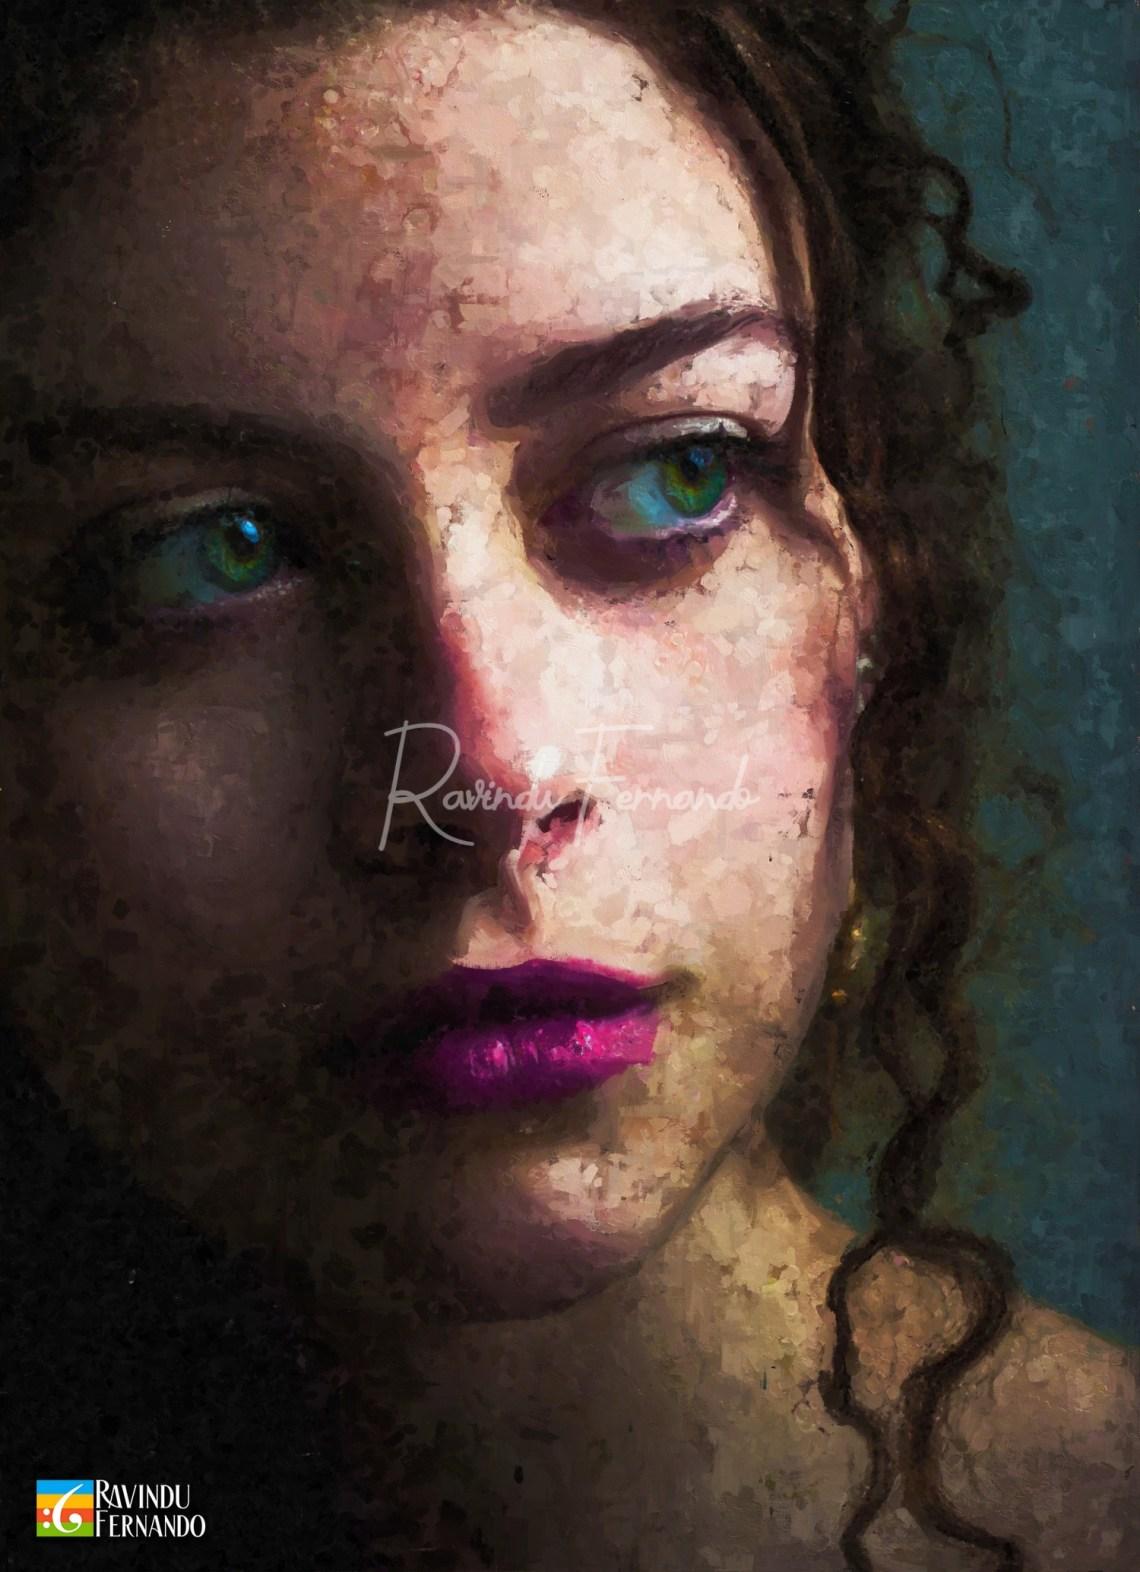 Dreamy Eyes - Digital Oil Painting By Ravindu Fernando